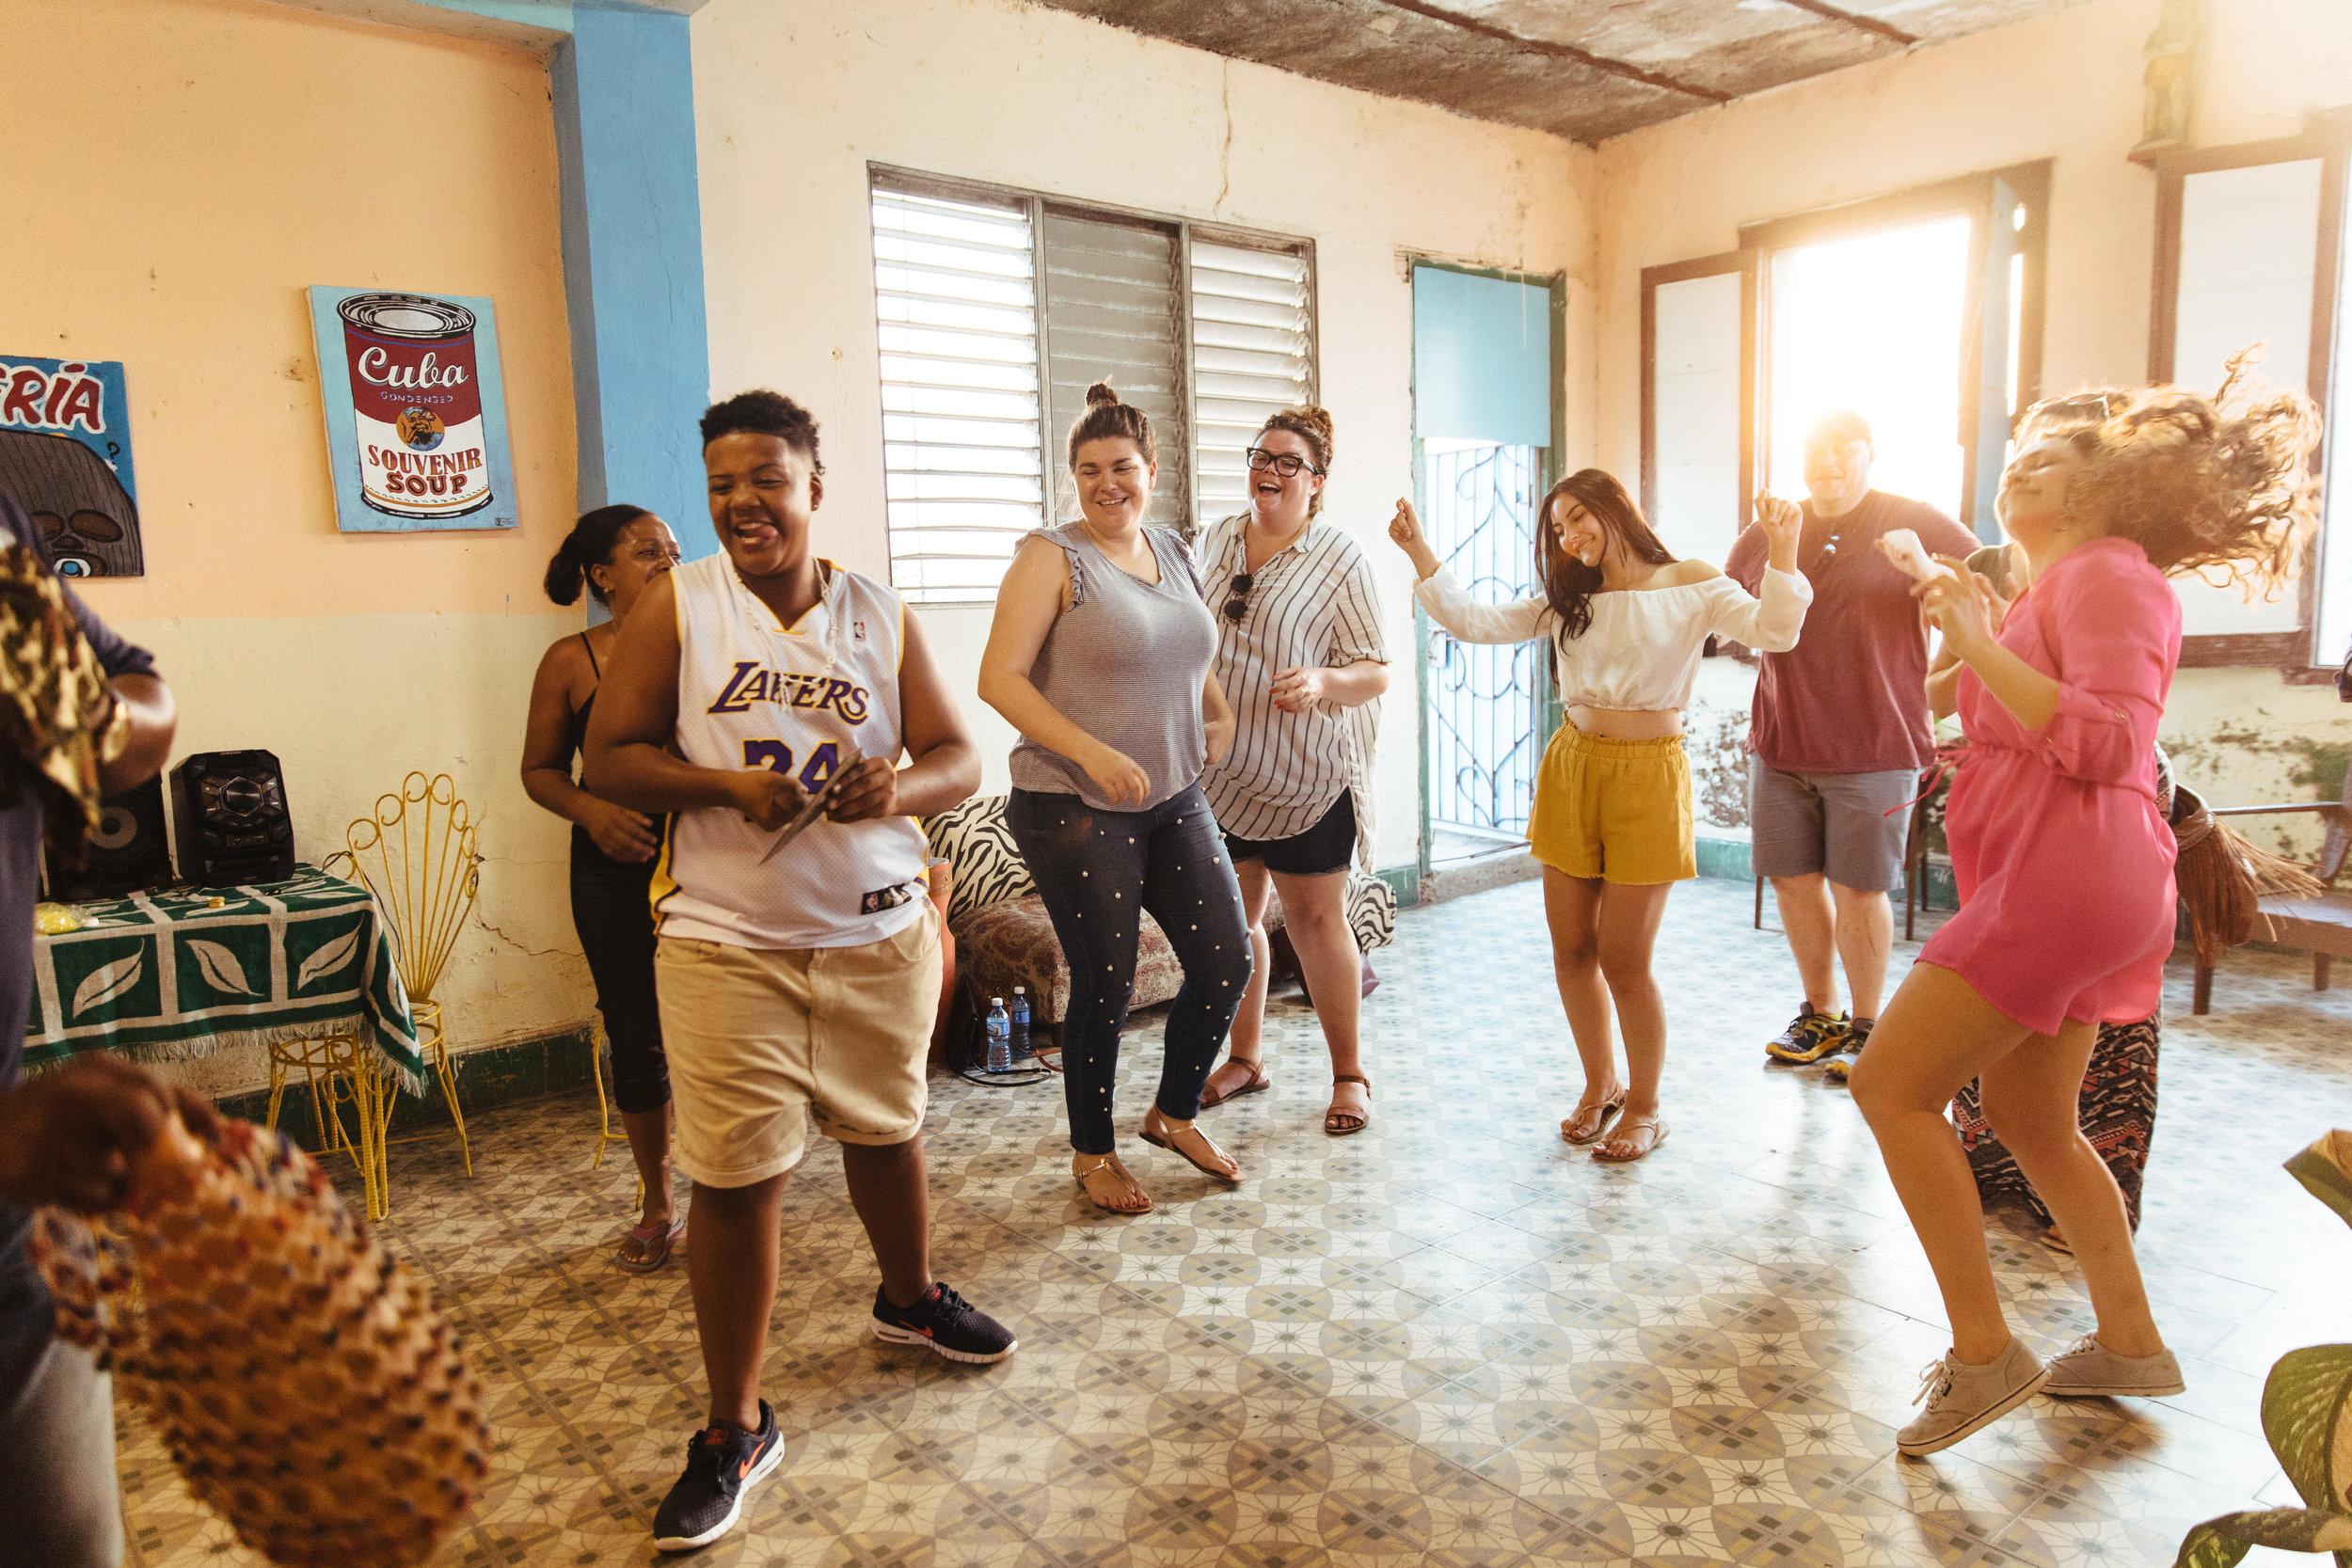 071217-Simone-Anne-Cuba-El-Camino-Travel-228 (1).jpg